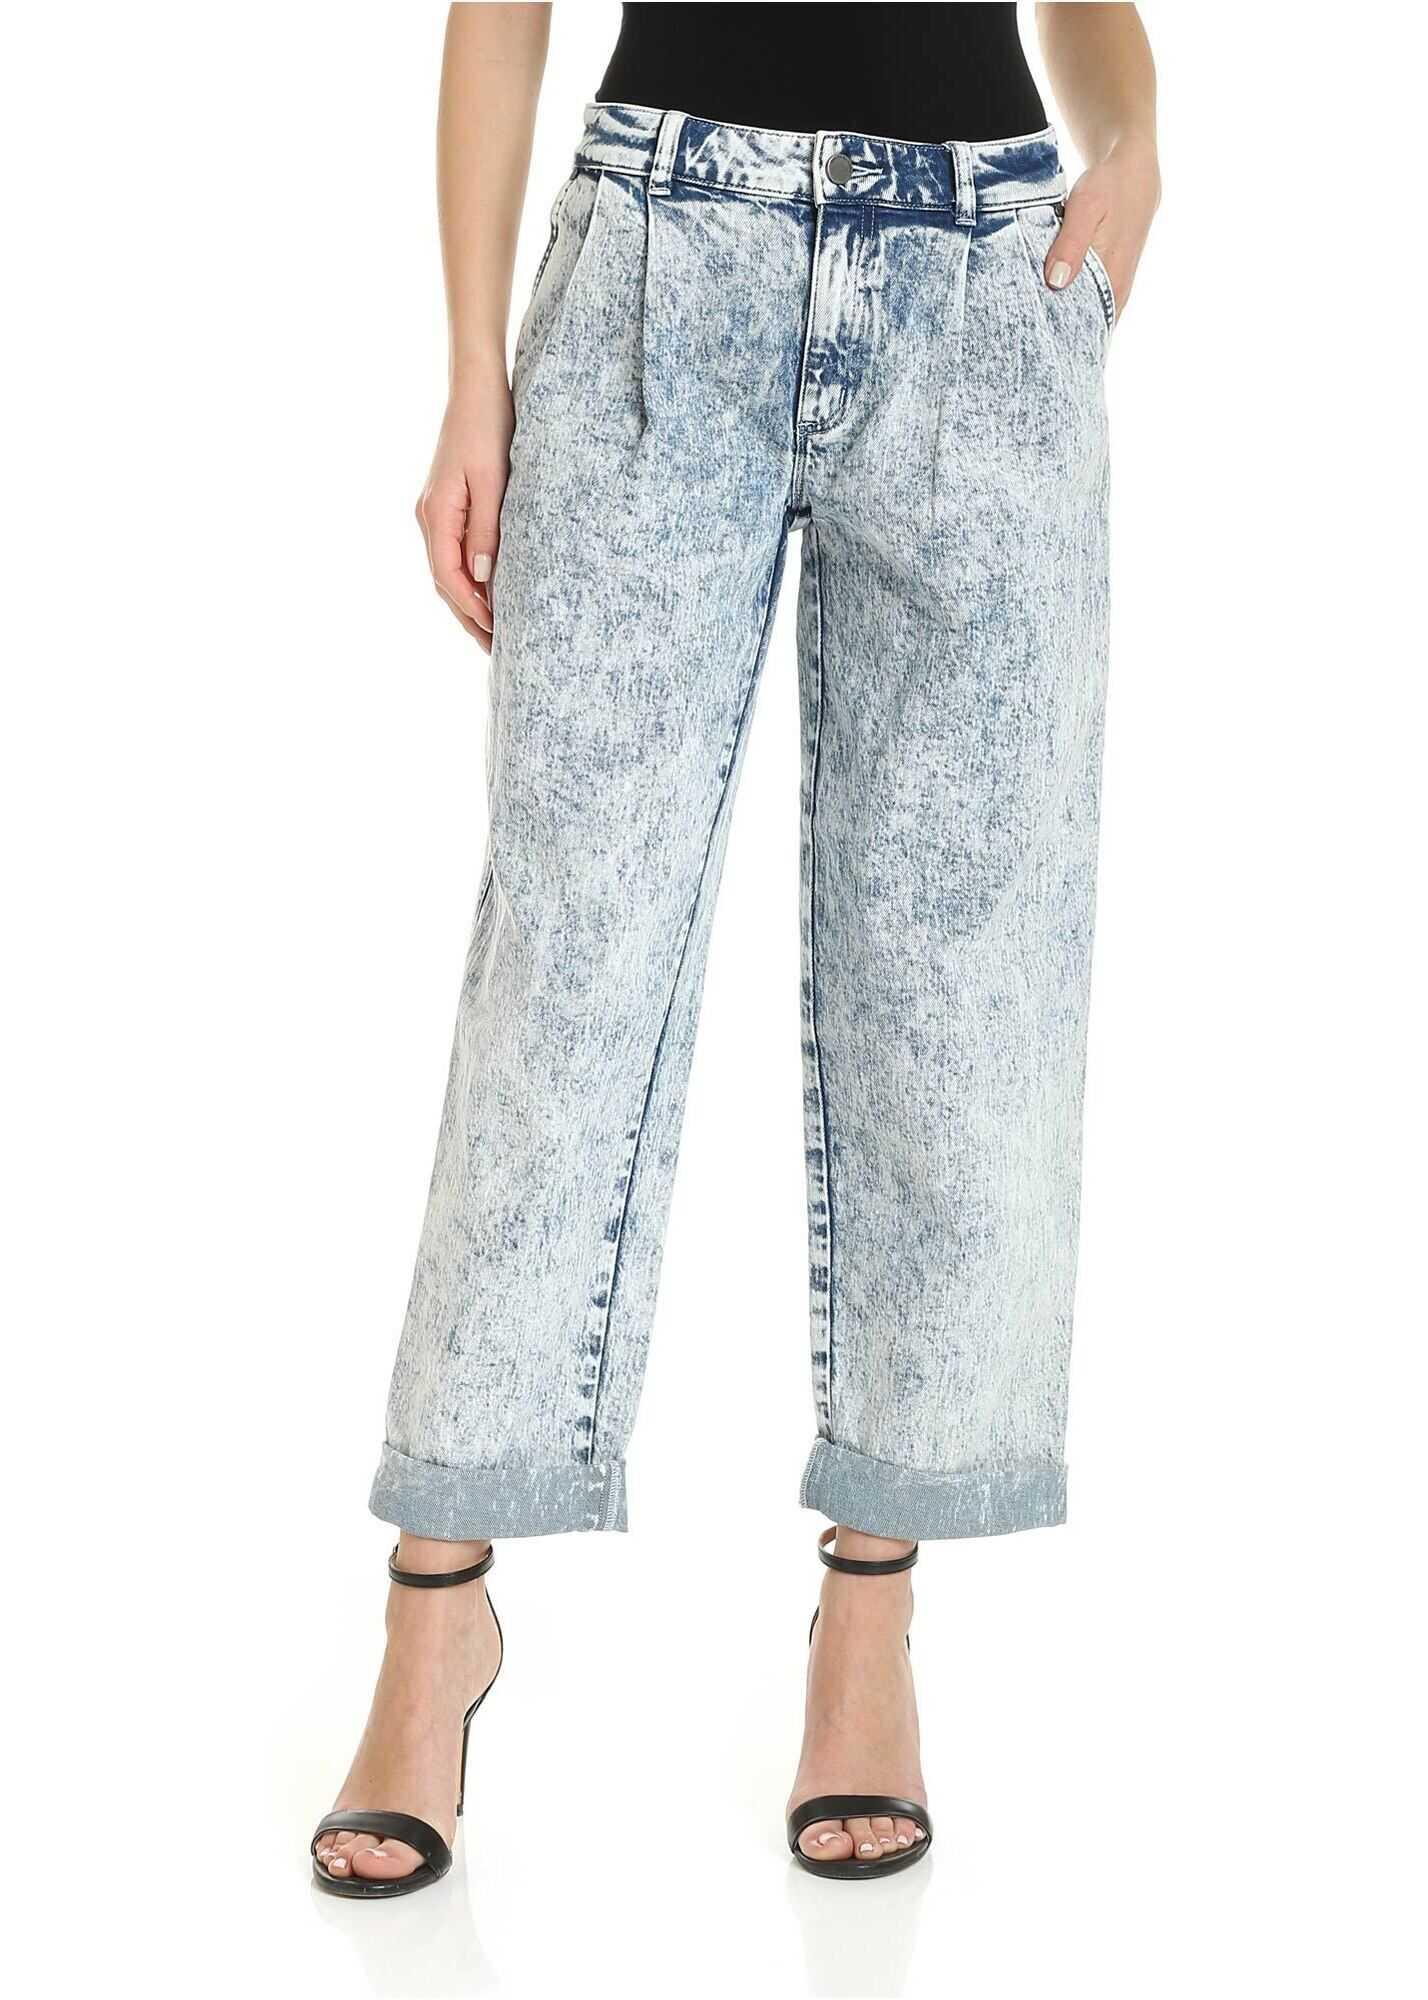 Michael Kors Bleached Effect Wide Leg Jeans In Blue Blue